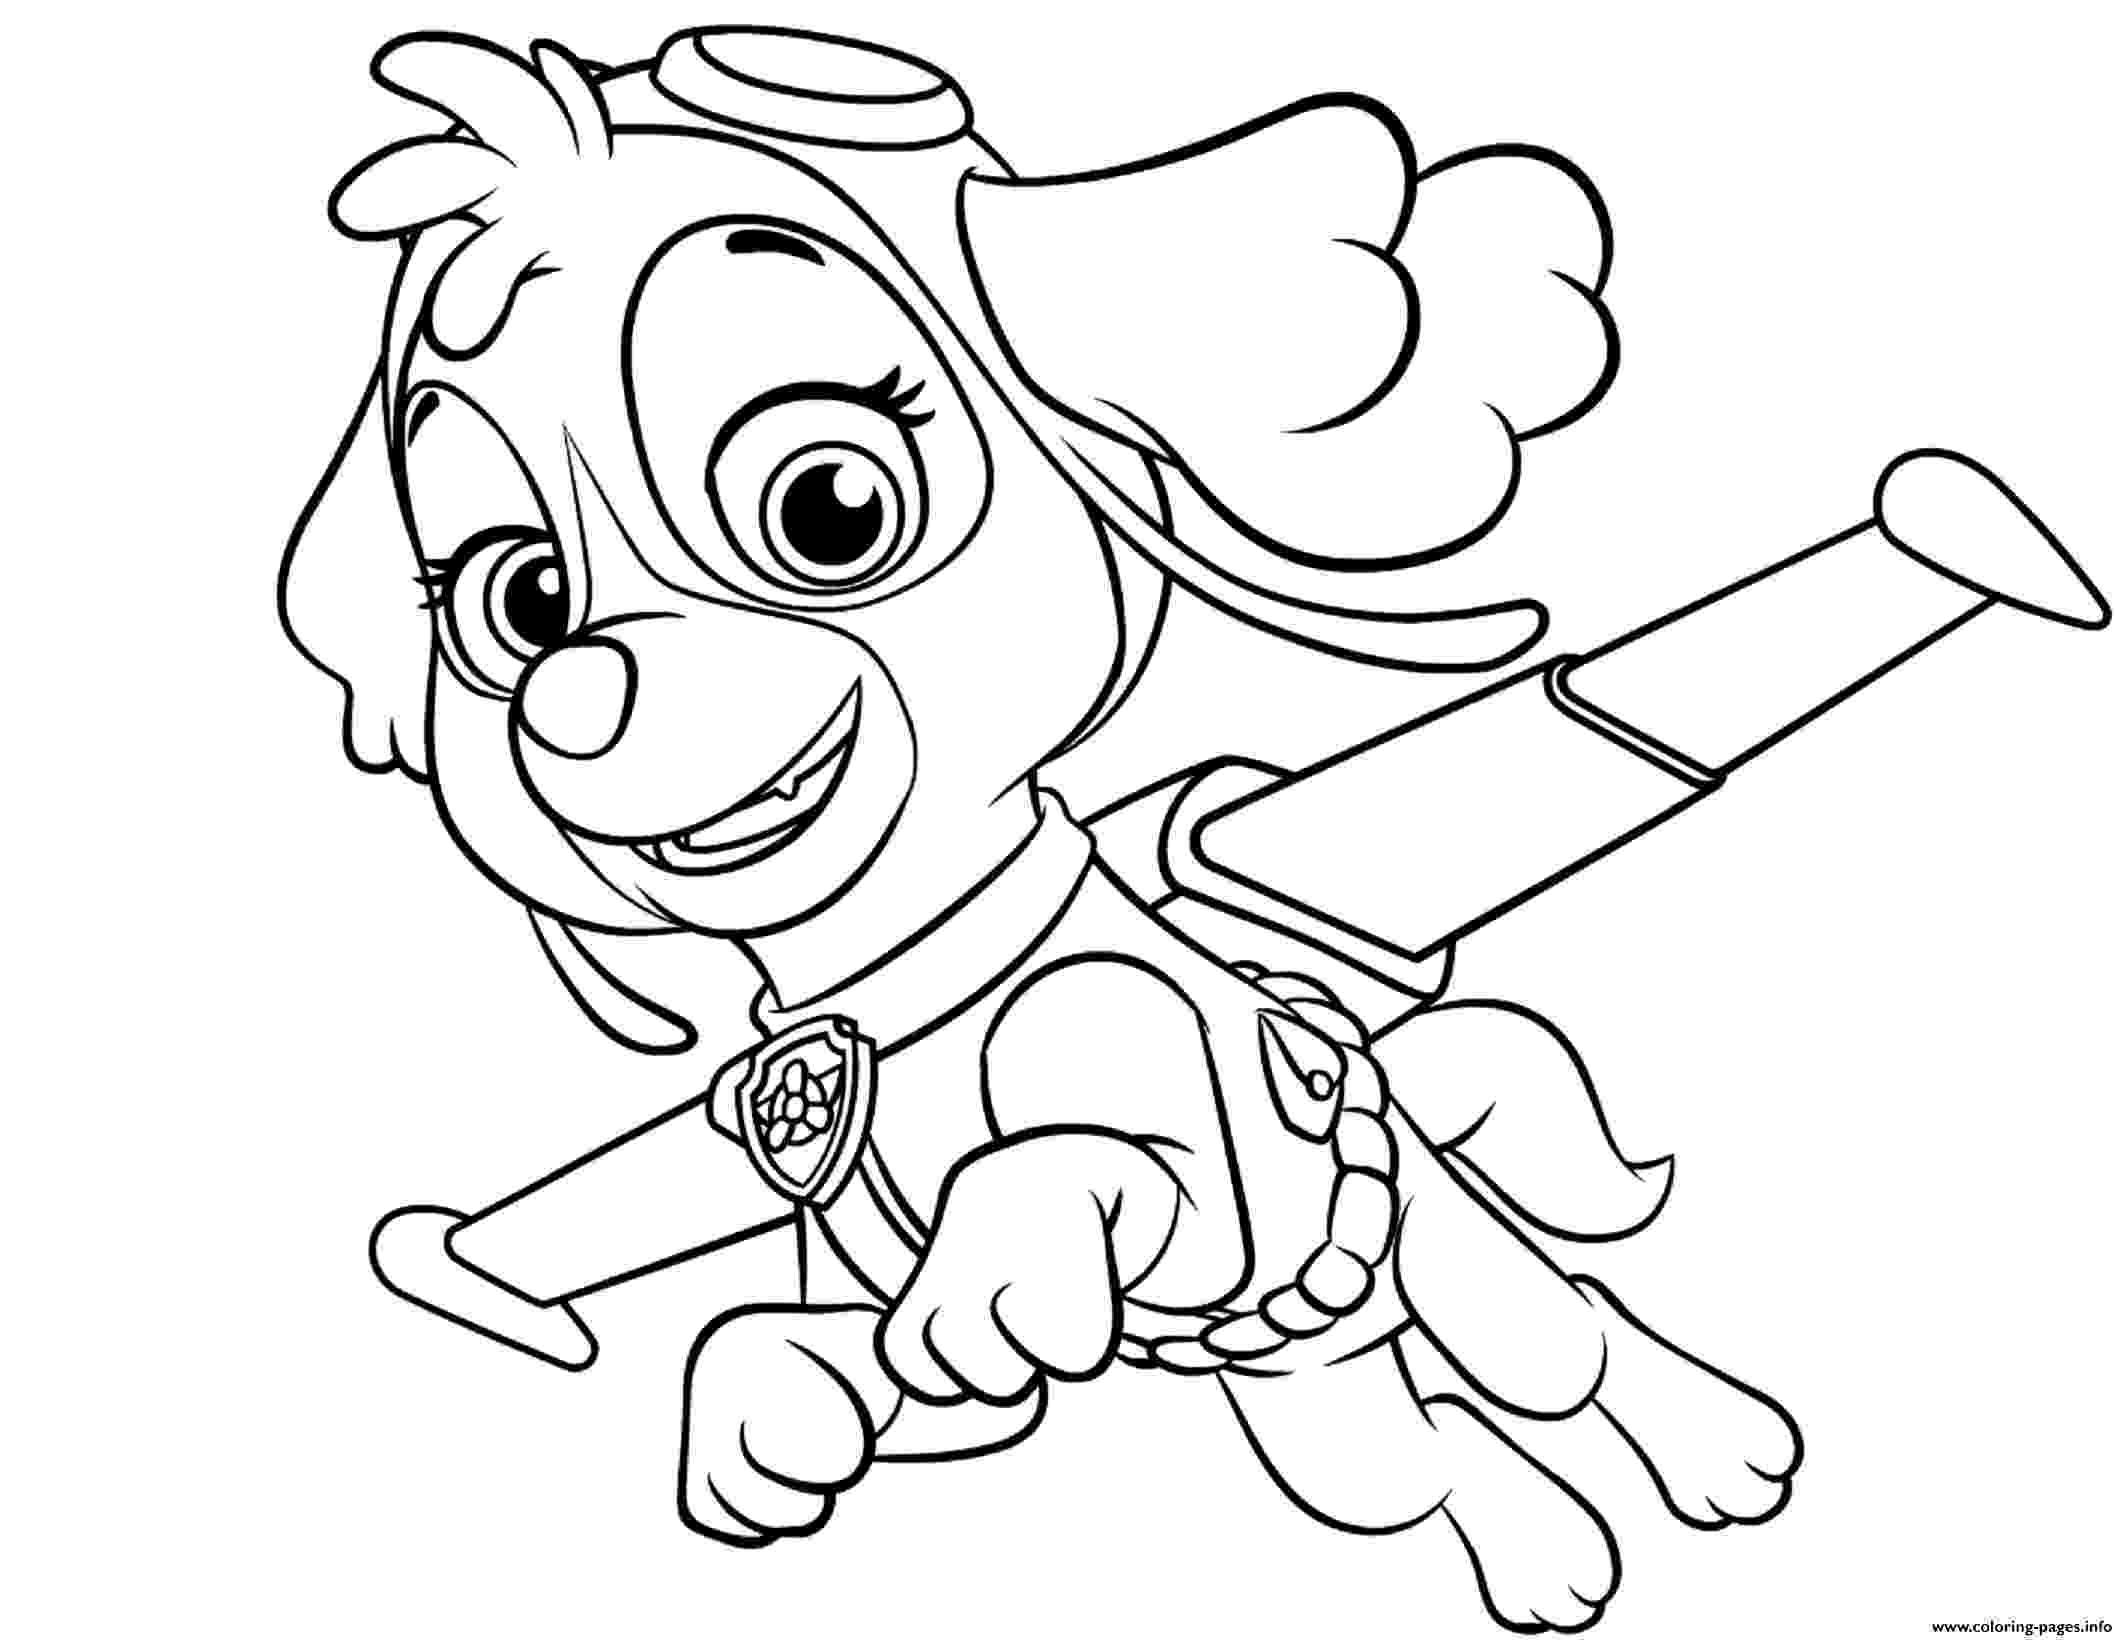 paw patrol coloring book free printable paw patrol coloring pages for kids paw coloring patrol book